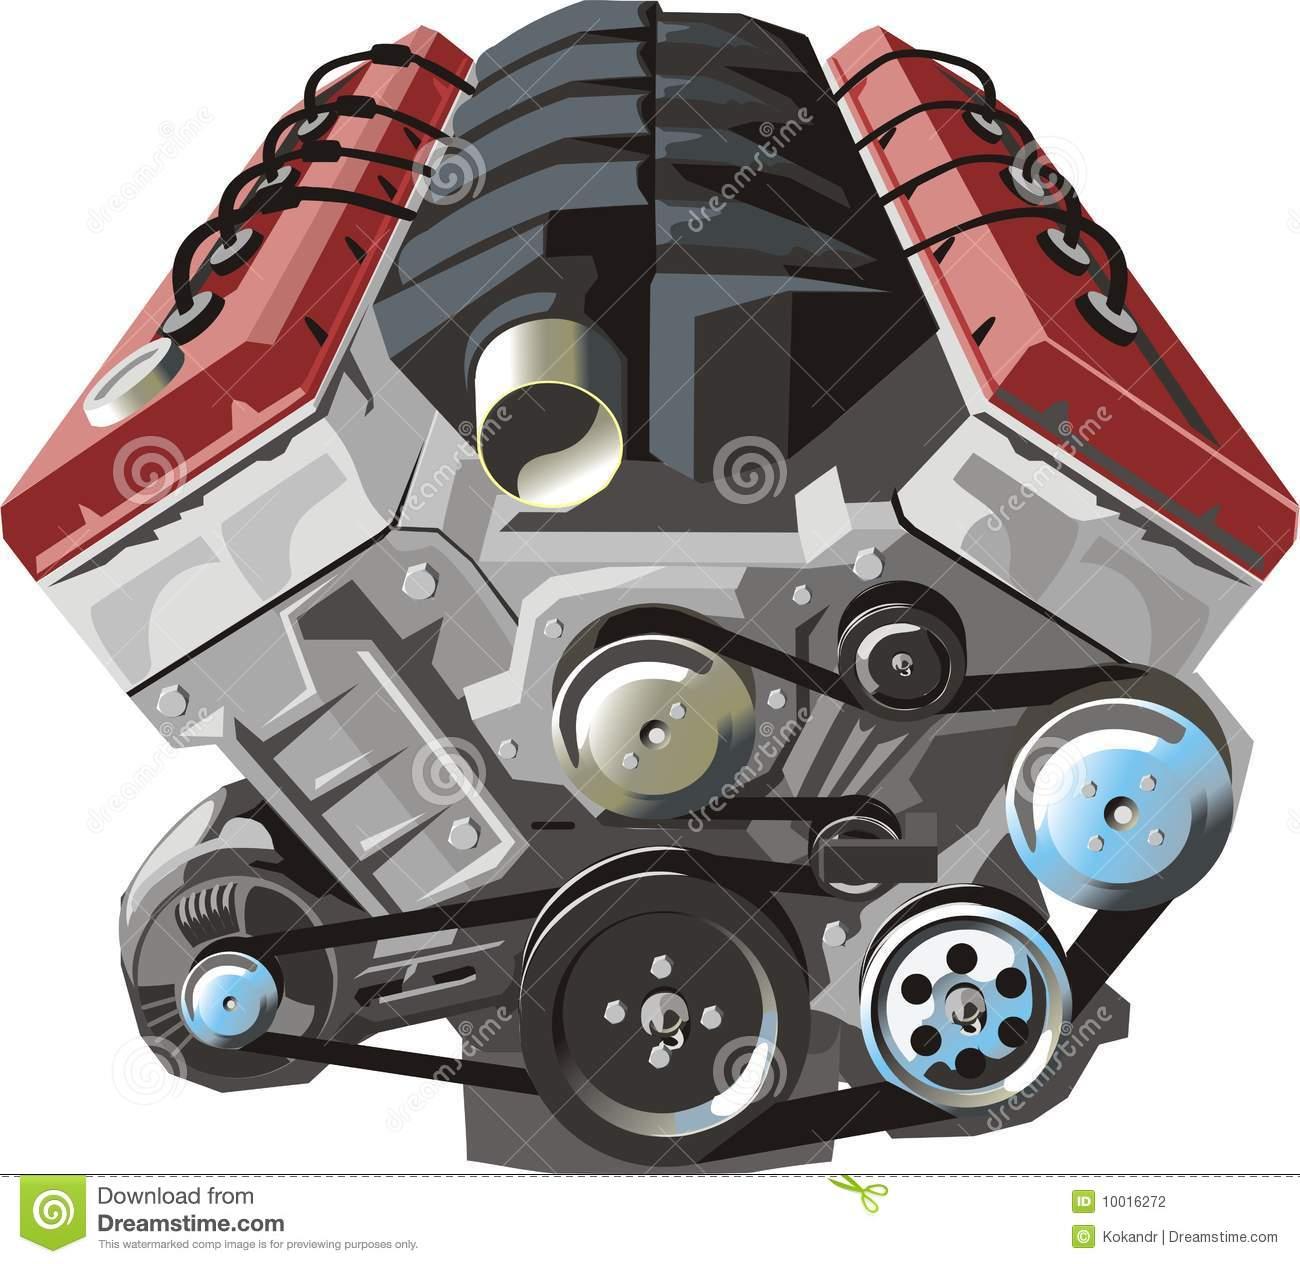 Motor clipart #6, Download drawings